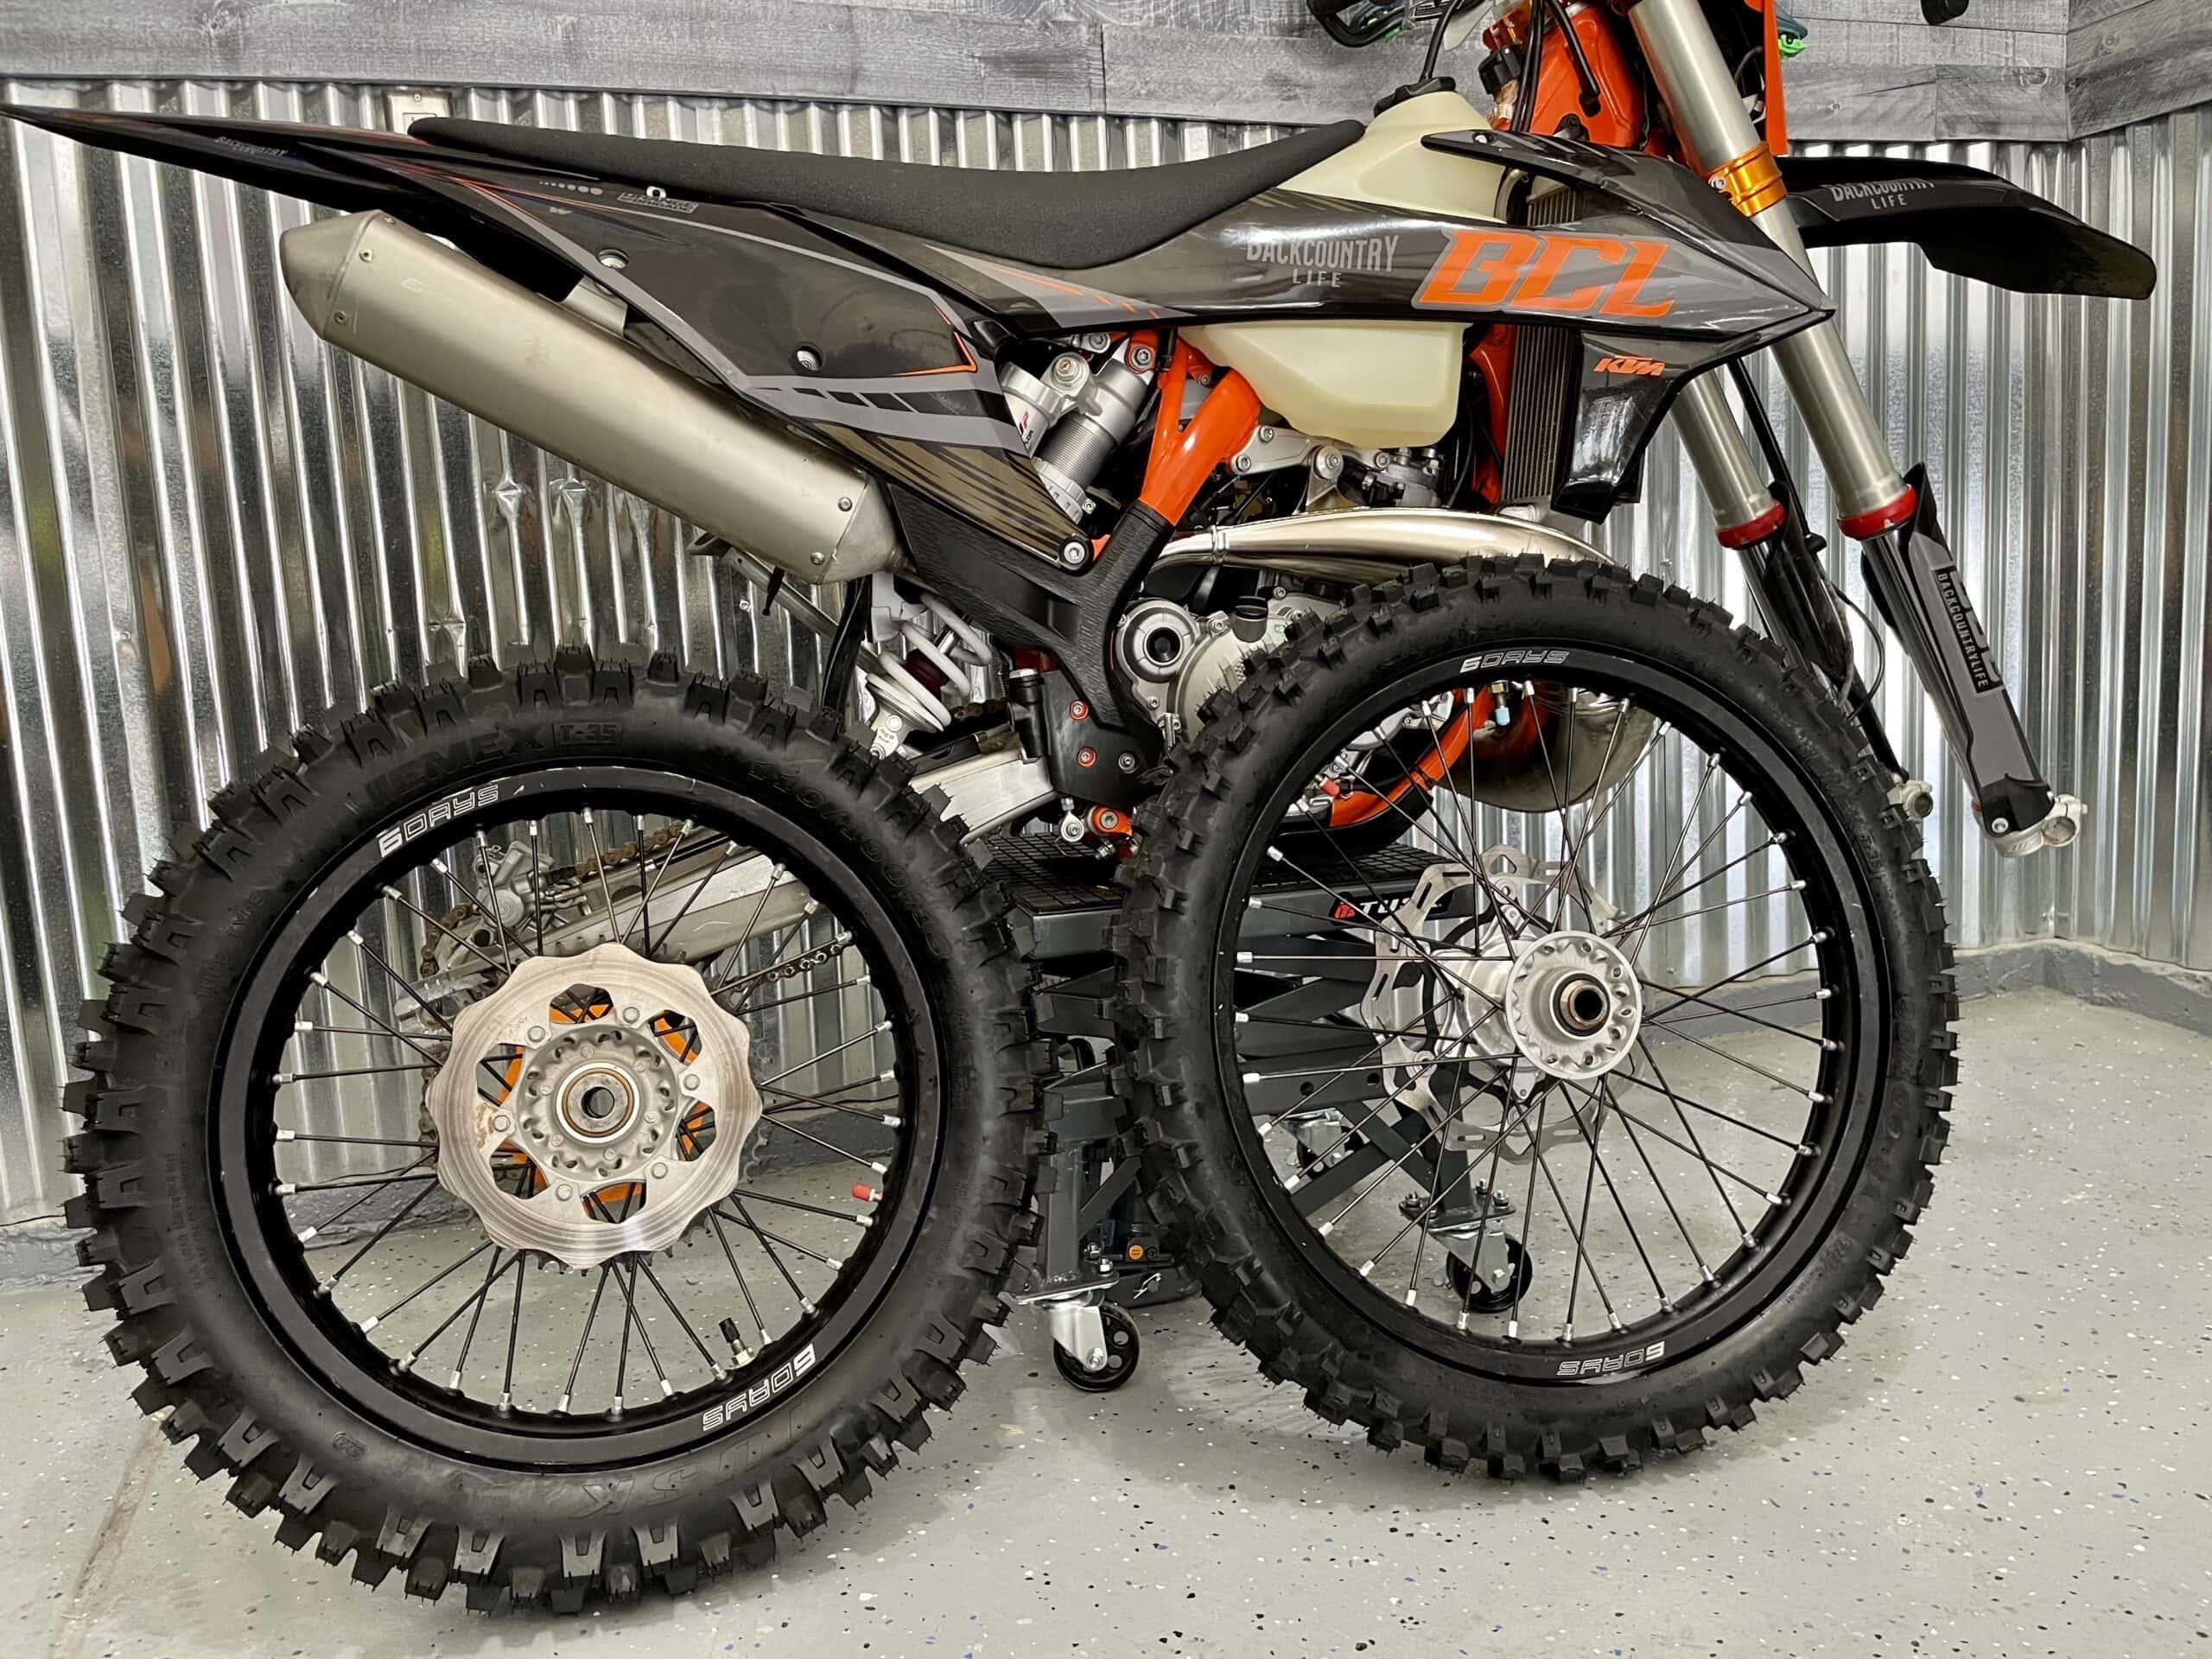 Tusk EMEX T35 tires